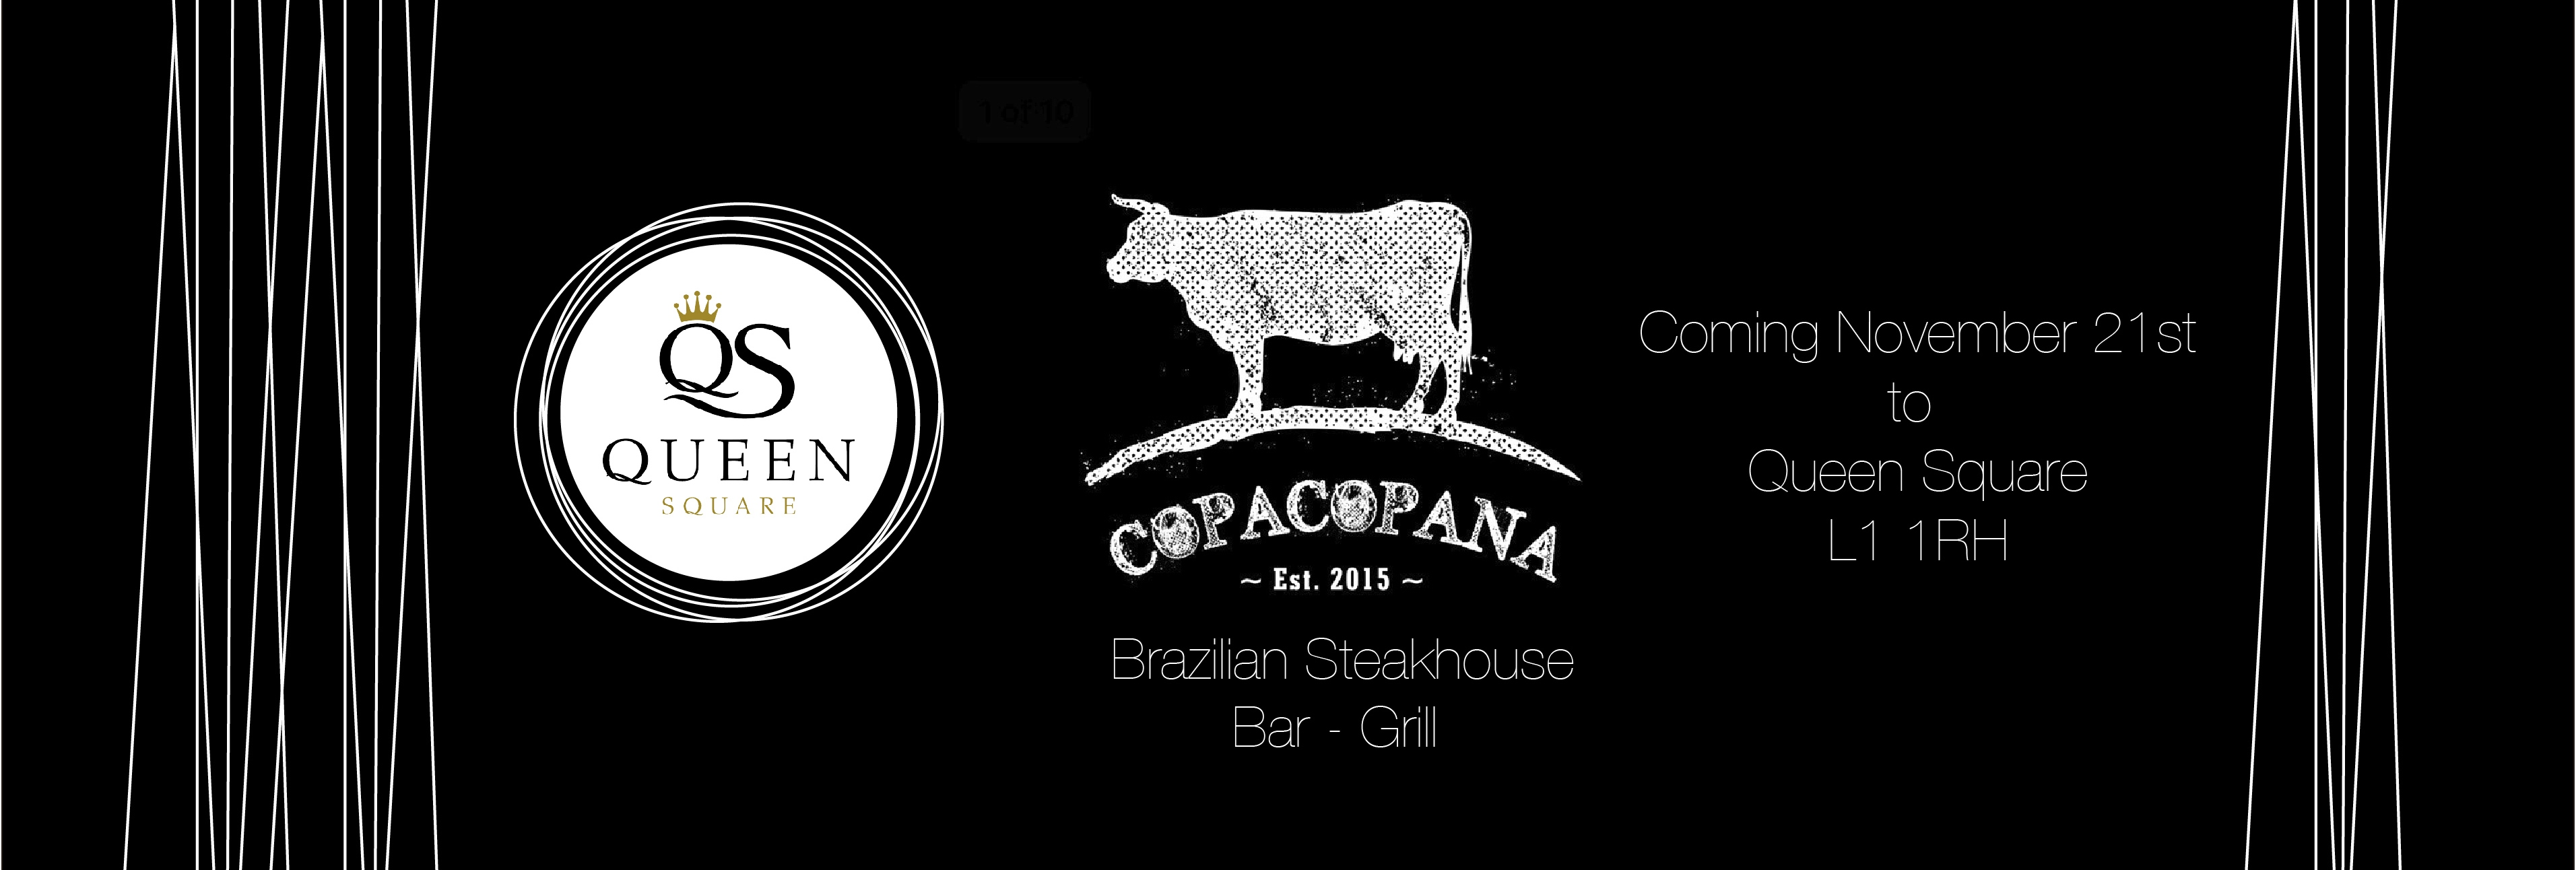 Copacopana-web-banner1